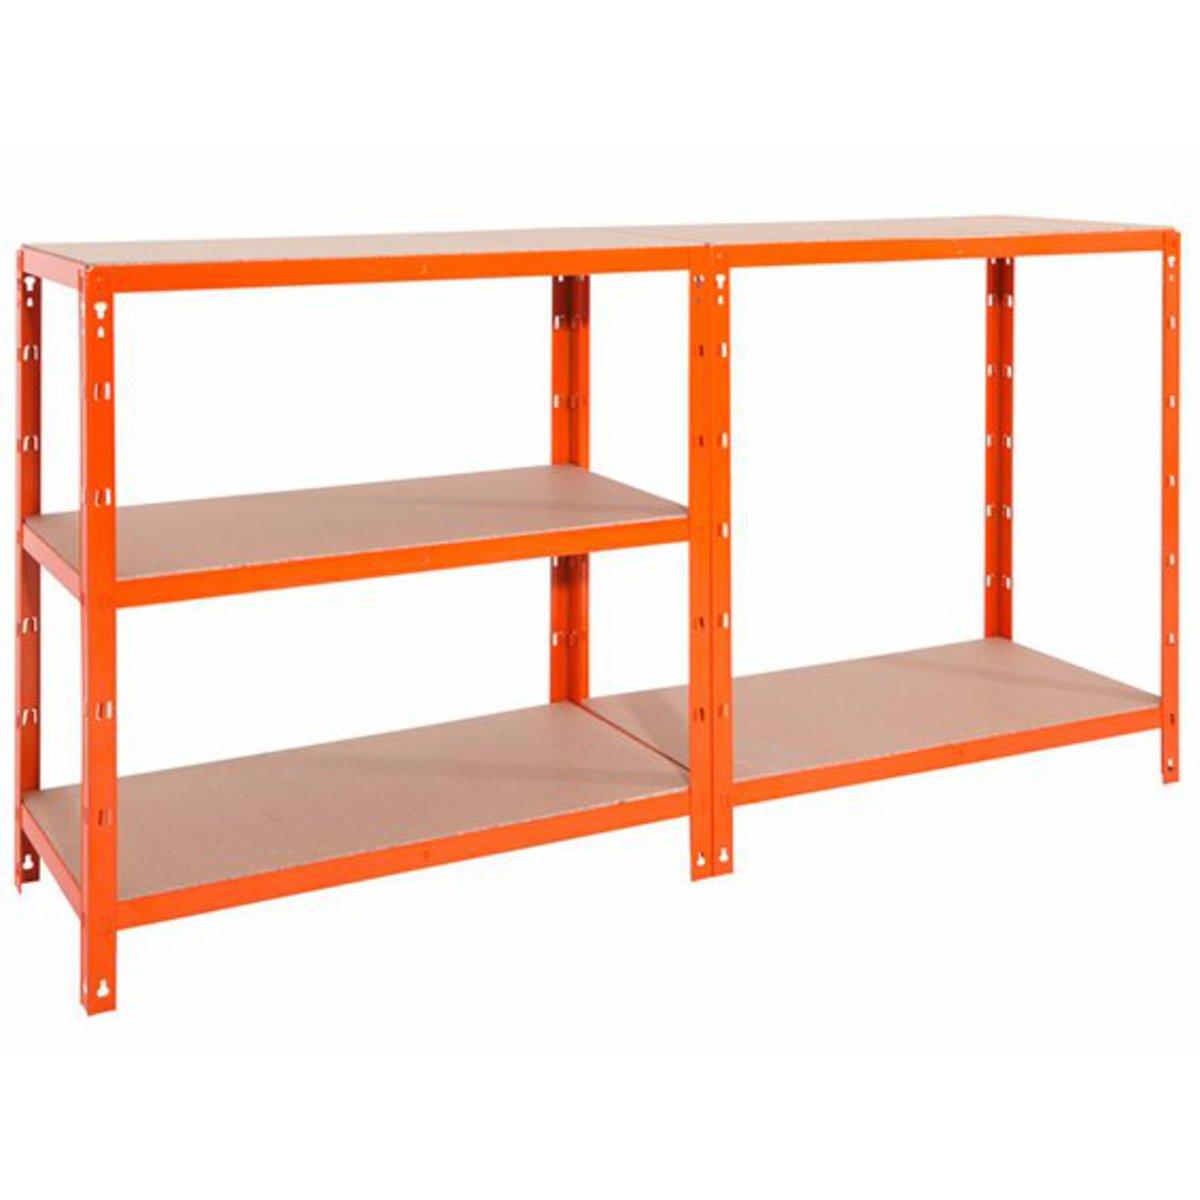 metall steckregal orange 180 cm x 90 cm x 40 cm von obi. Black Bedroom Furniture Sets. Home Design Ideas